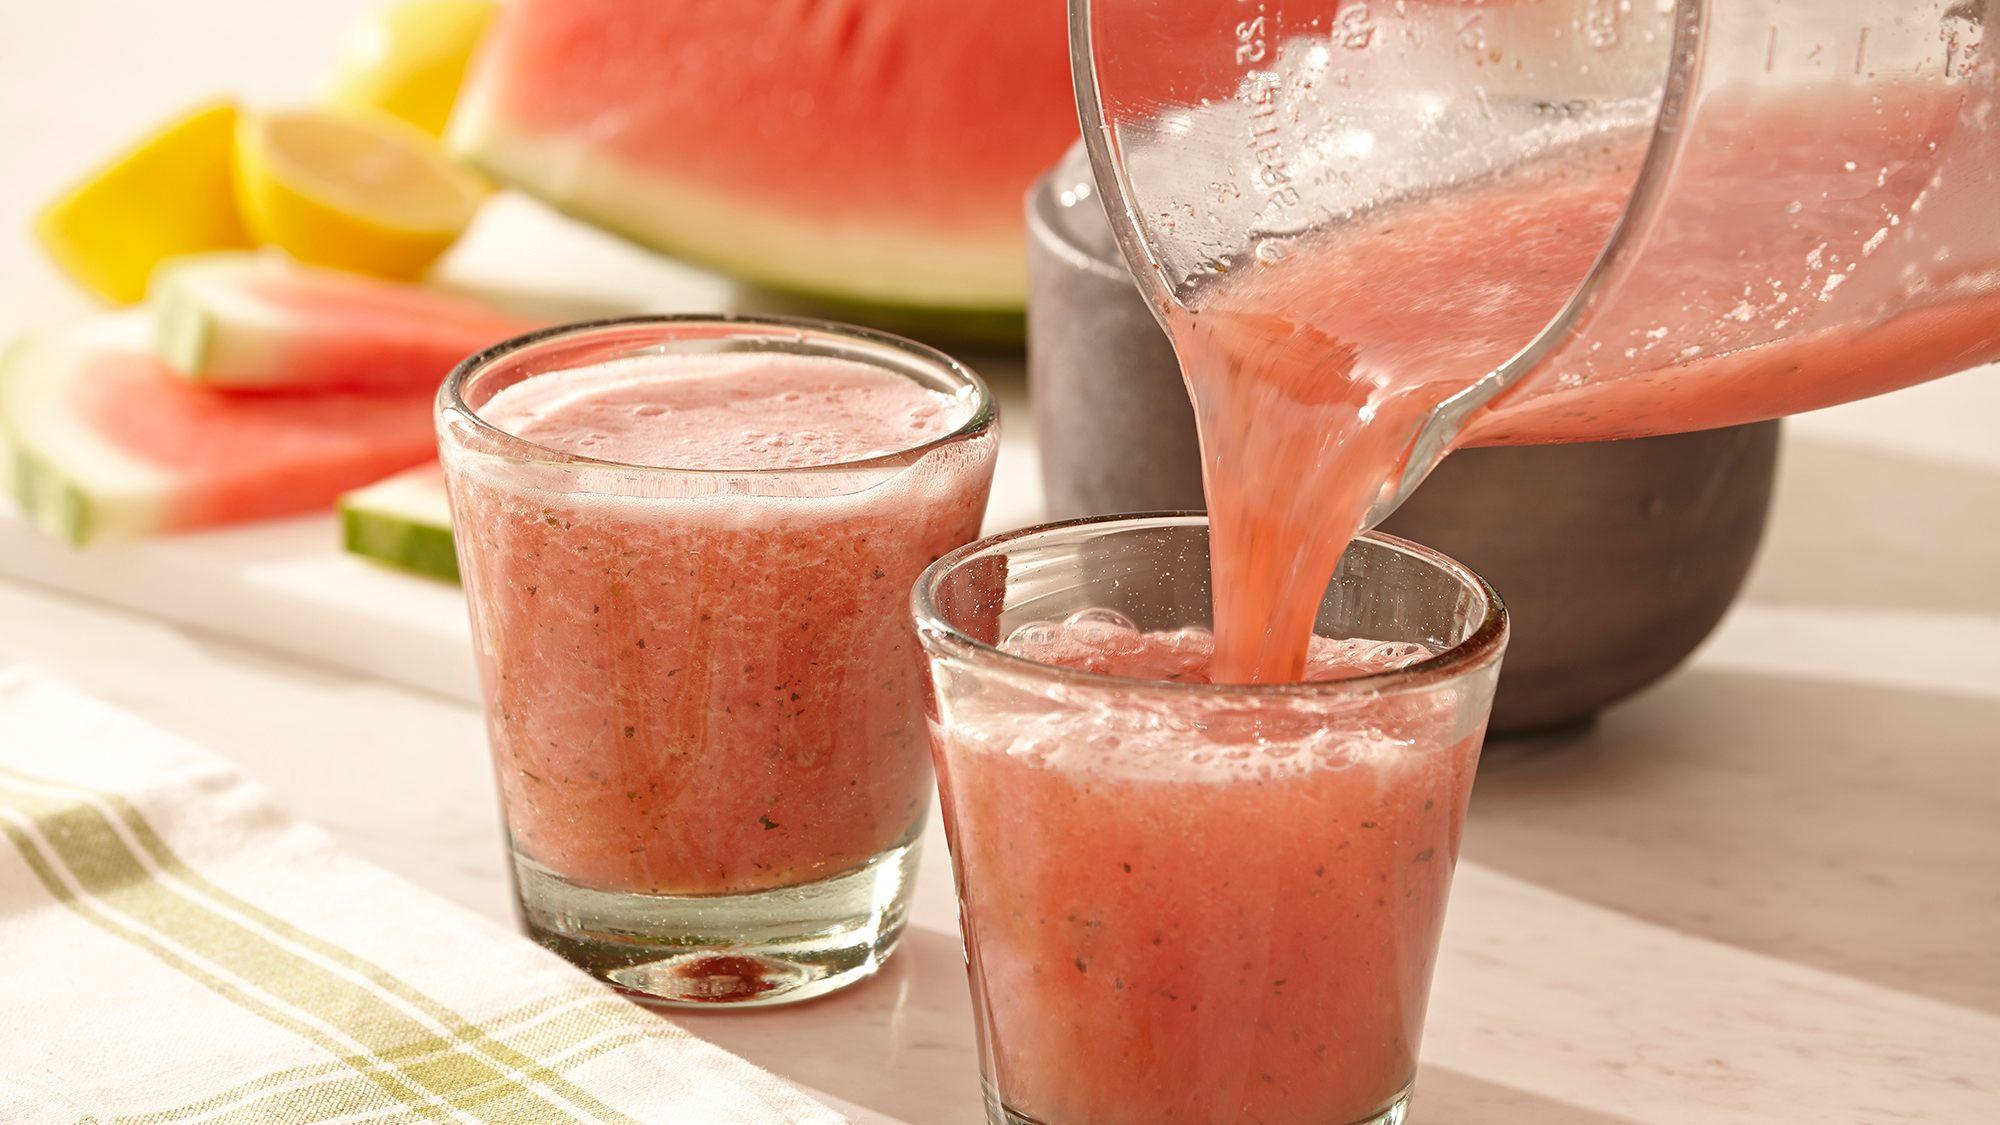 McCormick Basil and Watermelon Slushie